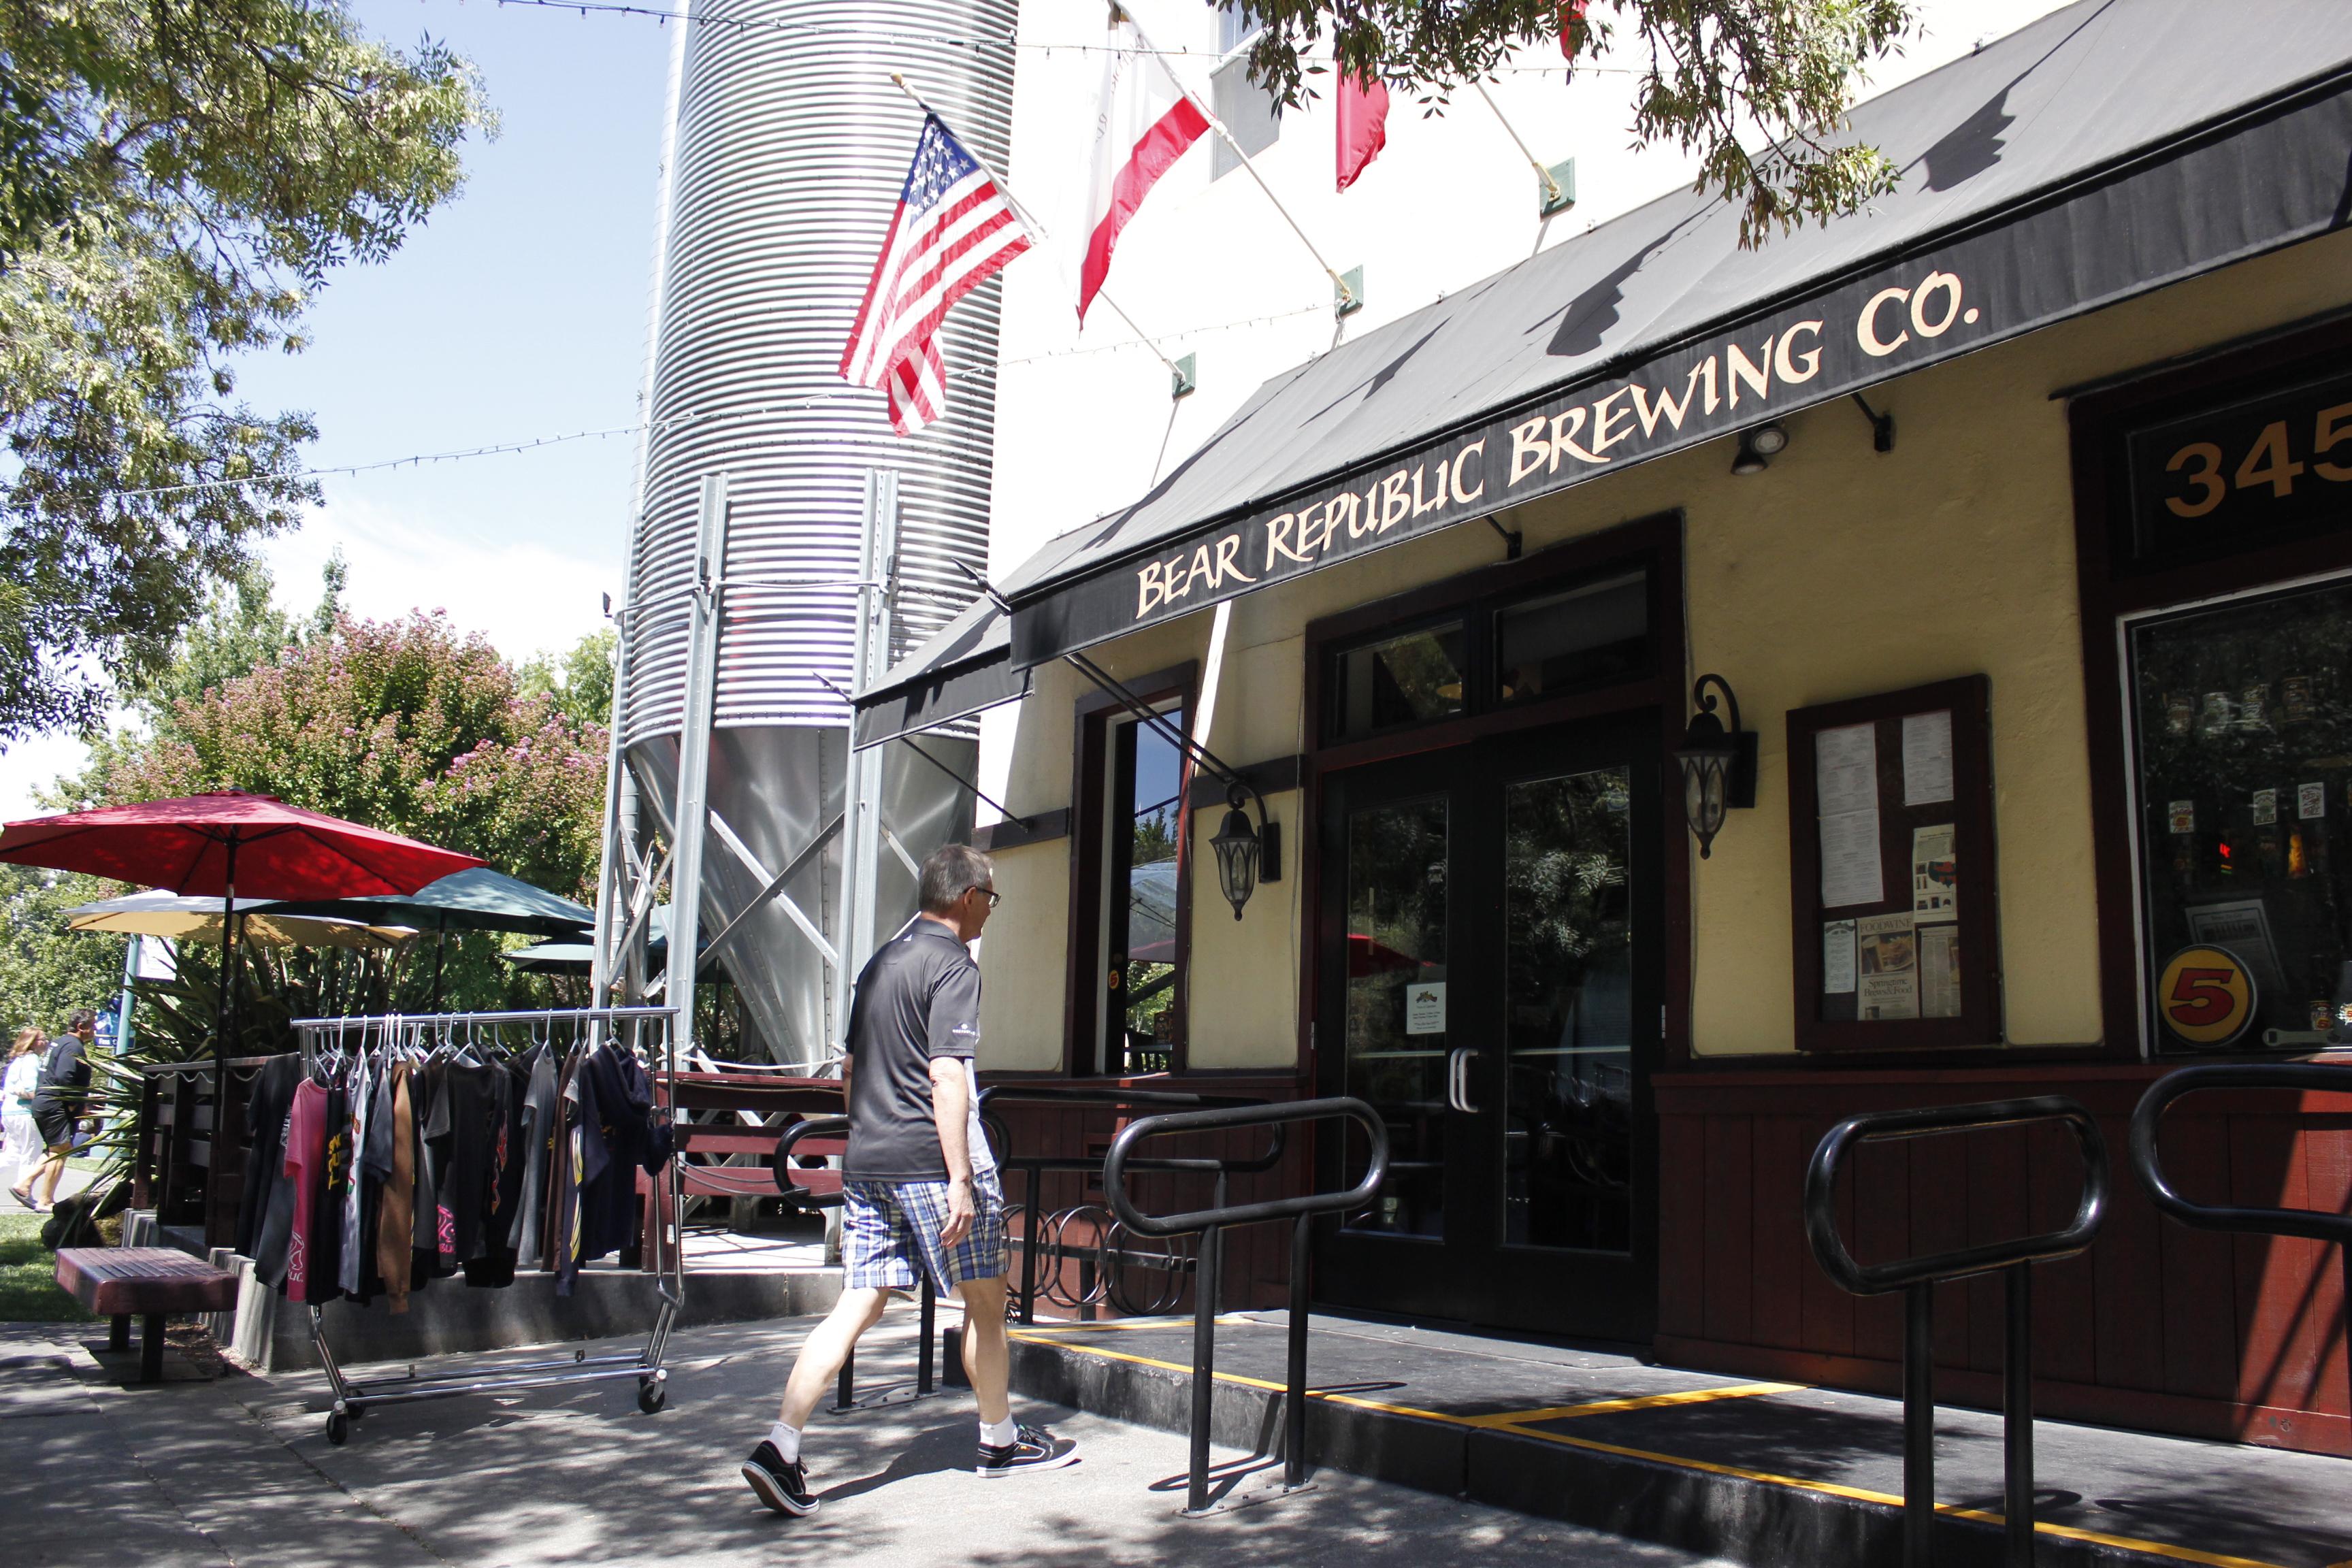 Bear Republic in Healdsburg, California